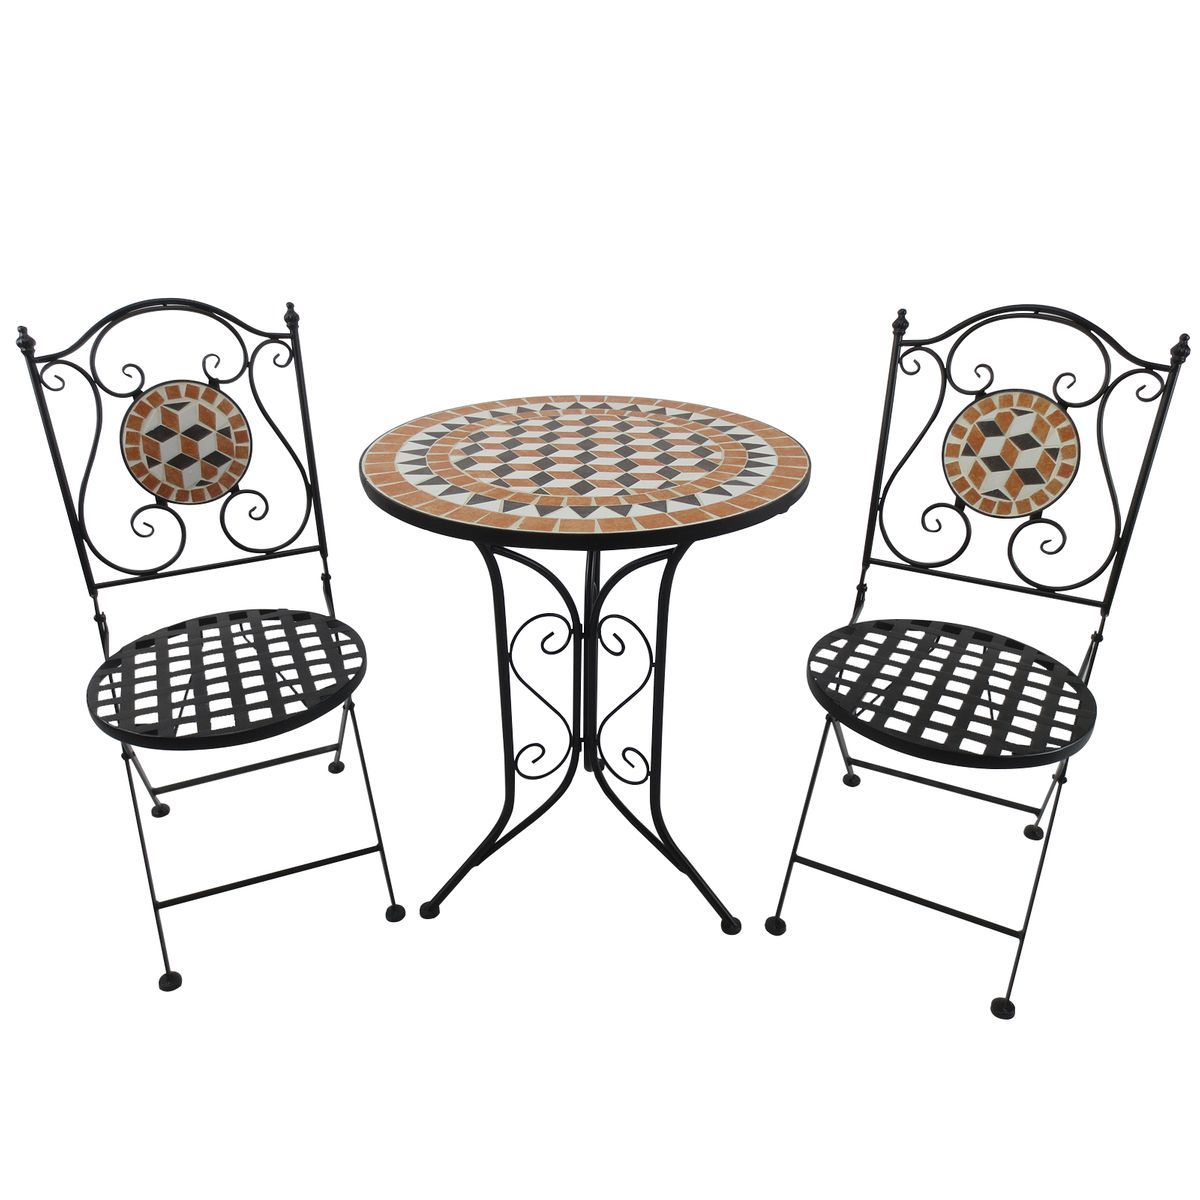 Salon De Jardin 2 Pers Style Fer Forge Mosaique Taille 4 Pers